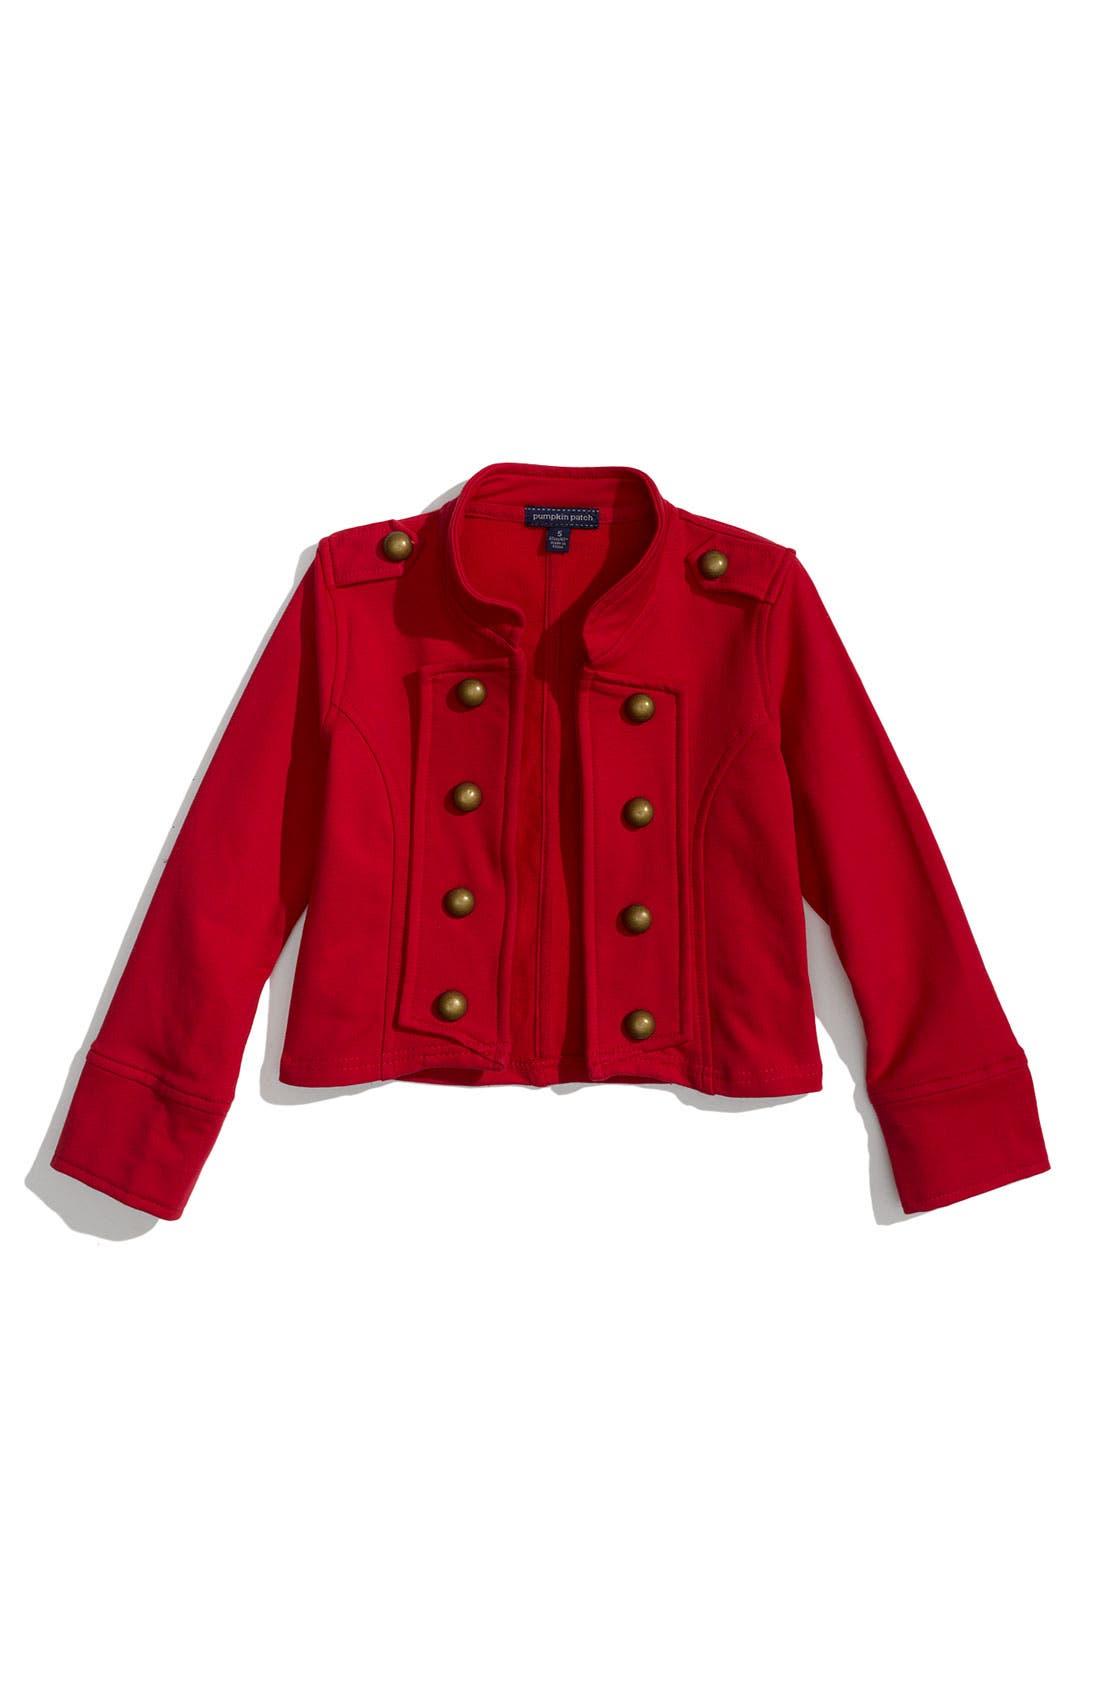 Main Image - Pumpkin Patch Stretch Cotton Military Jacket (Little Girls)